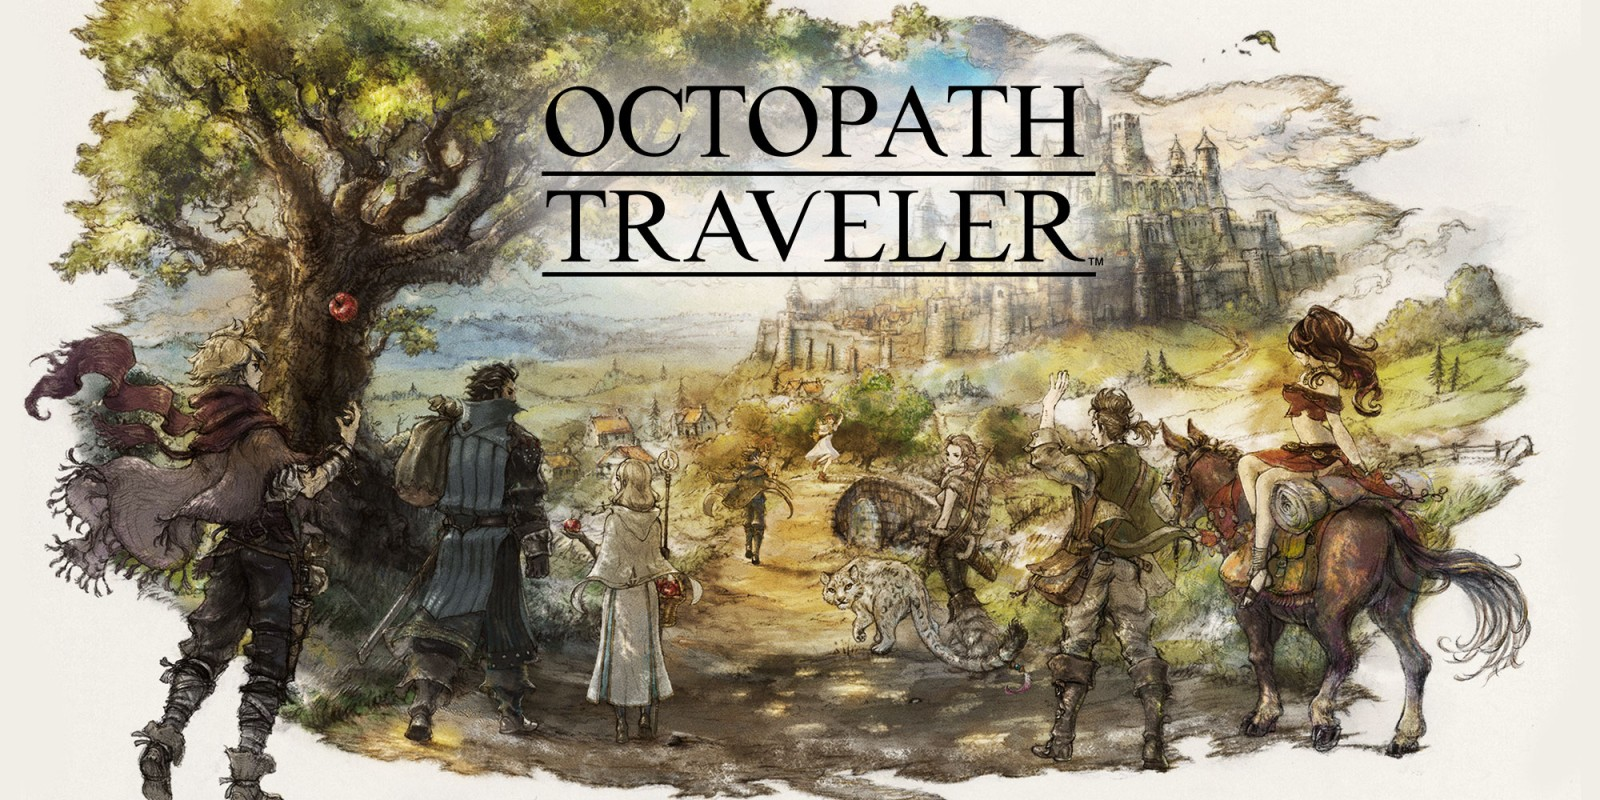 OCTOPATH TRAVELER Apk Full Mobile Version Free Download